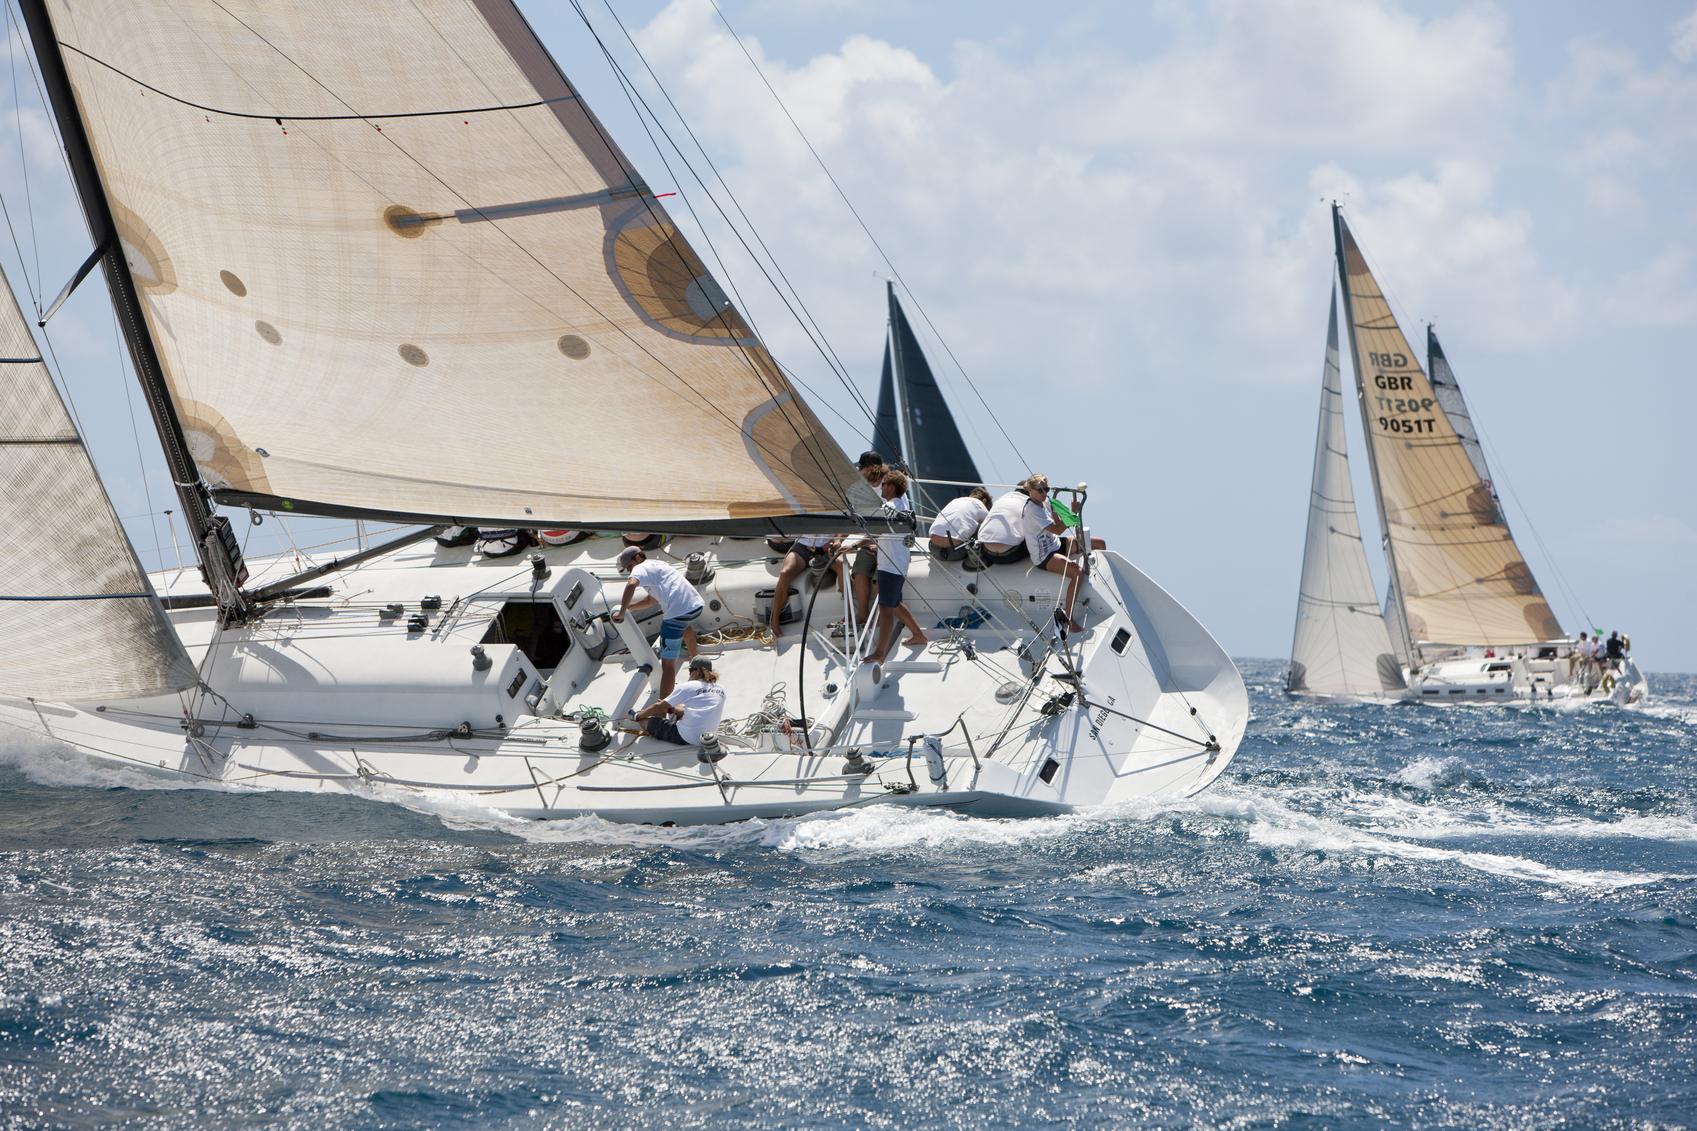 "Caribbean Sea between St. Thomas and St. John, US Virgin Islands - March 30, 2014: sailing crew on a sailboat ""Falcon"" (USA) racing in 2014 St. Thomas International Regatta"